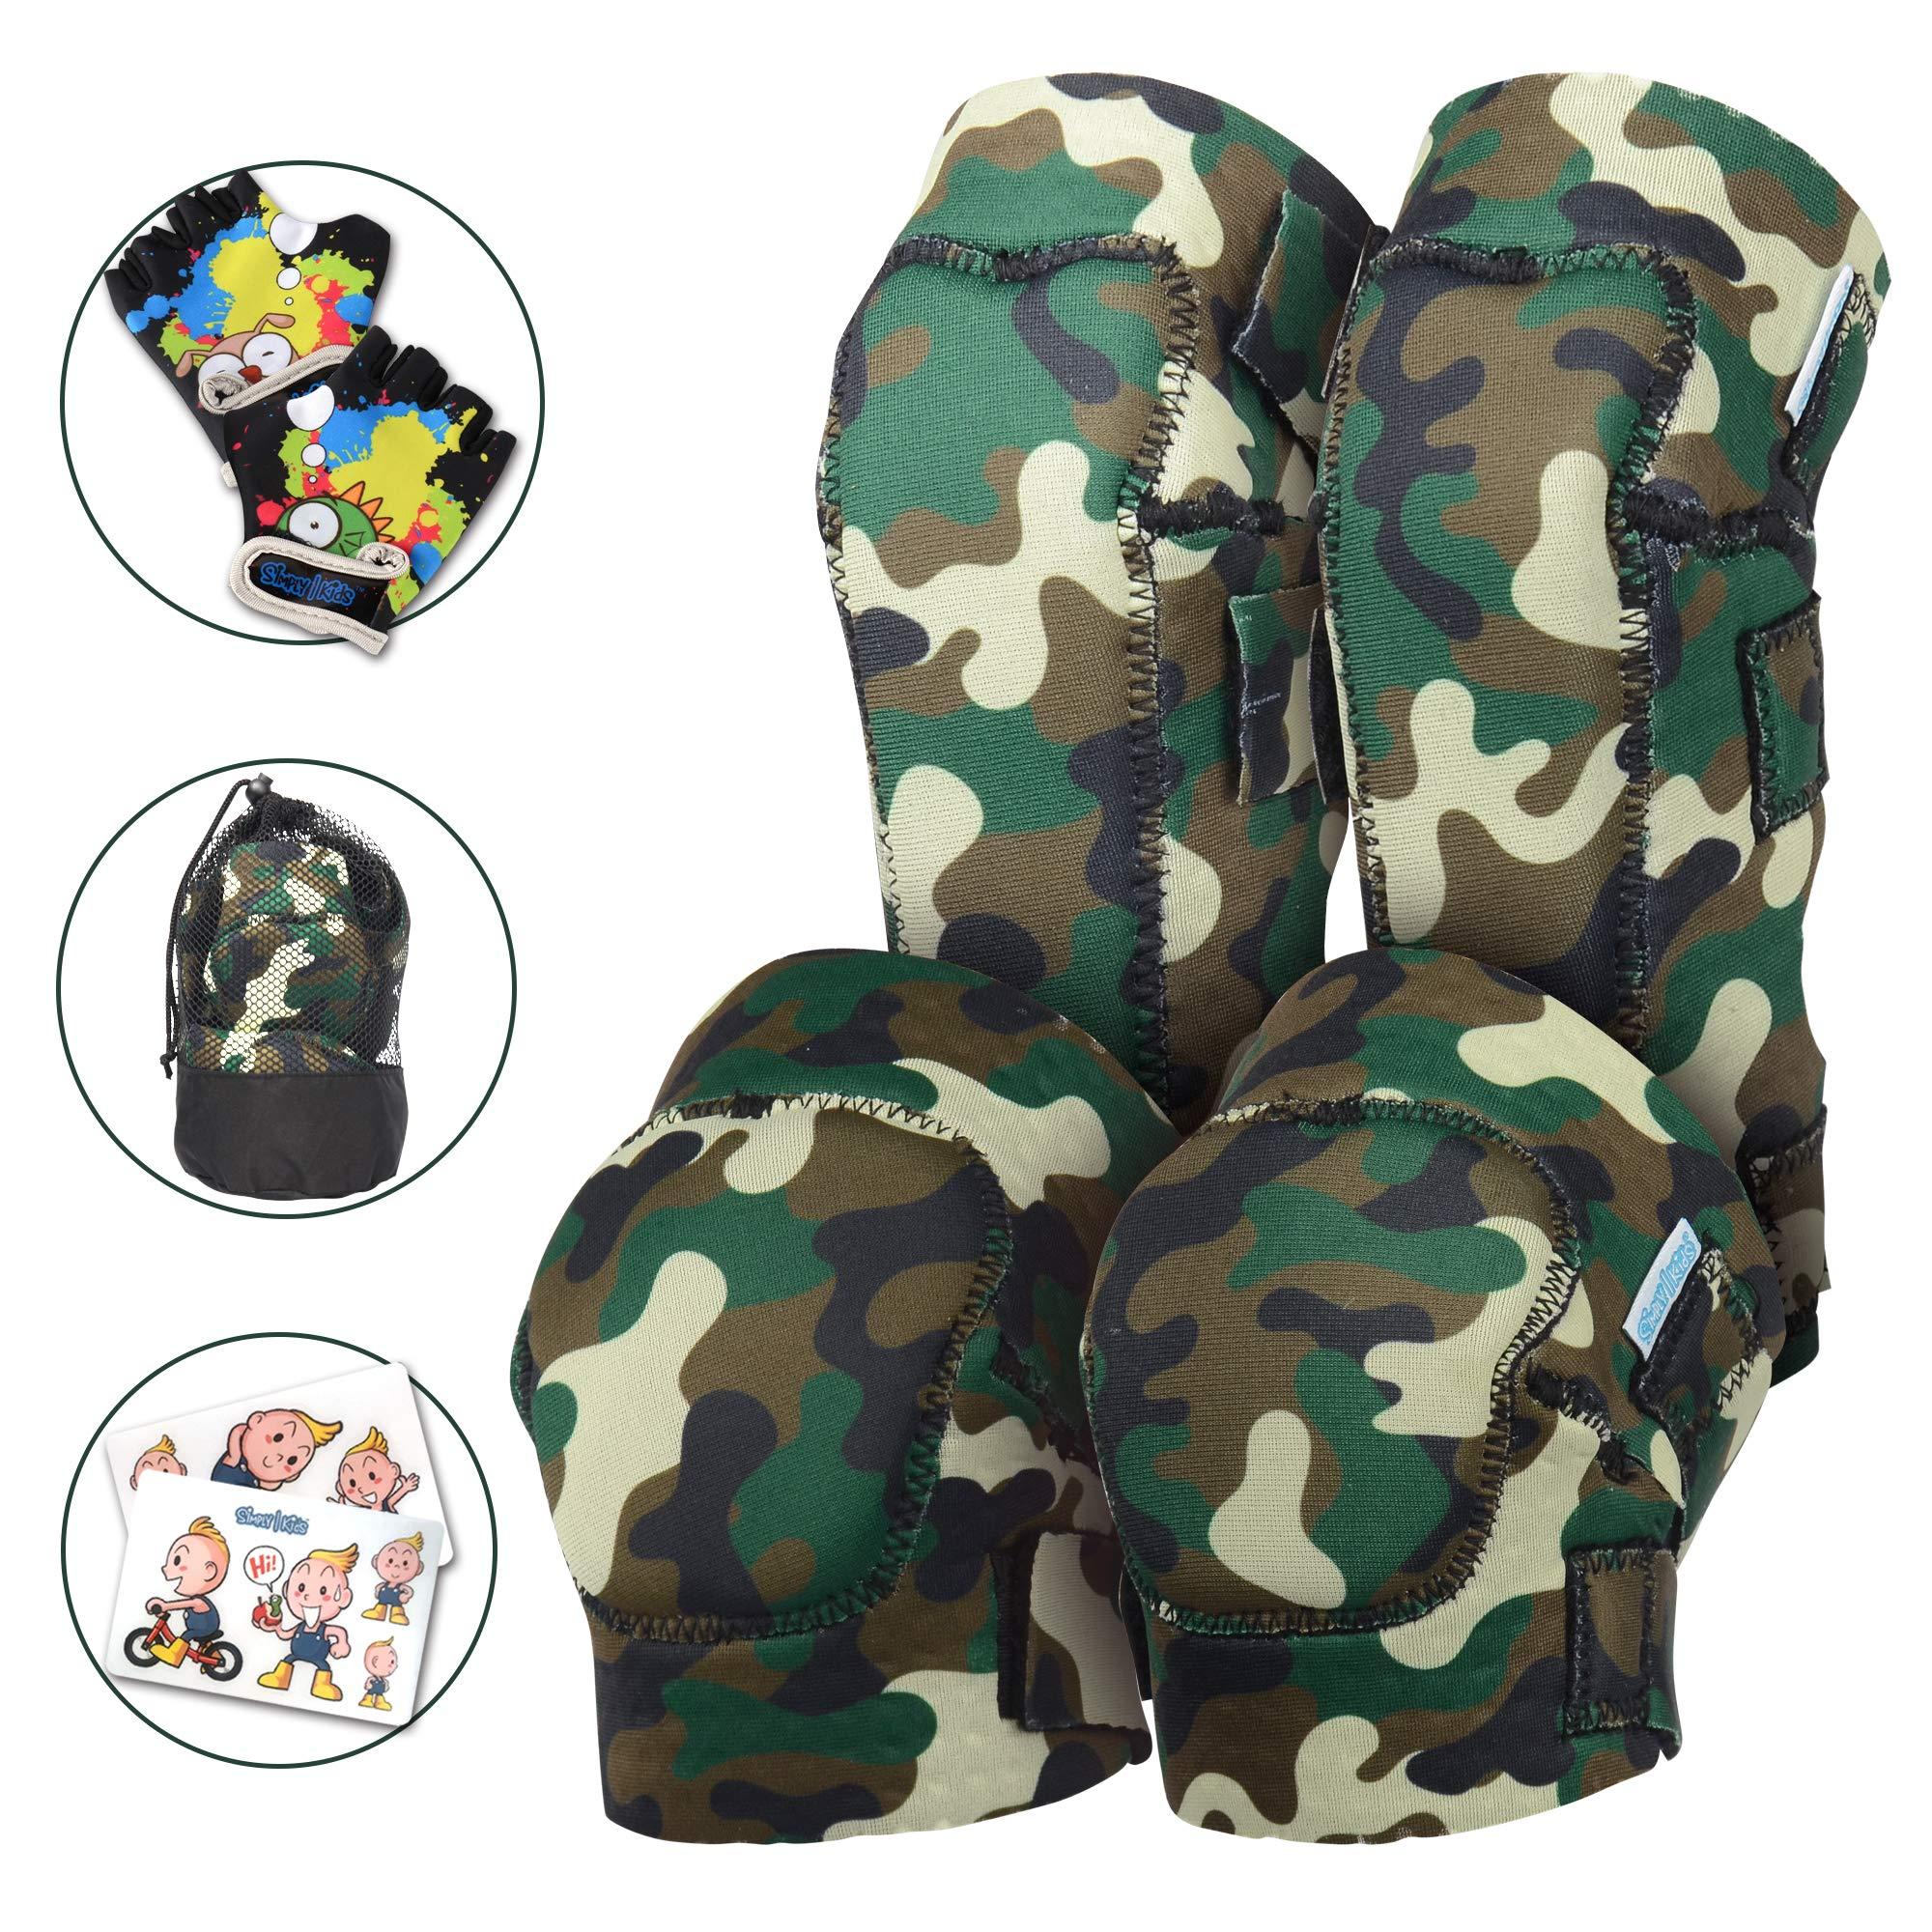 Innovative Soft Kids Knee and Elbow Pads with Bike Gloves | Toddler Protective Gear Set w/Mesh Bag | Roller-Skating, Skateboard, Bike Children Boys Girls ((2nd Gen) Forest Camo, Medium (4-8 Years))